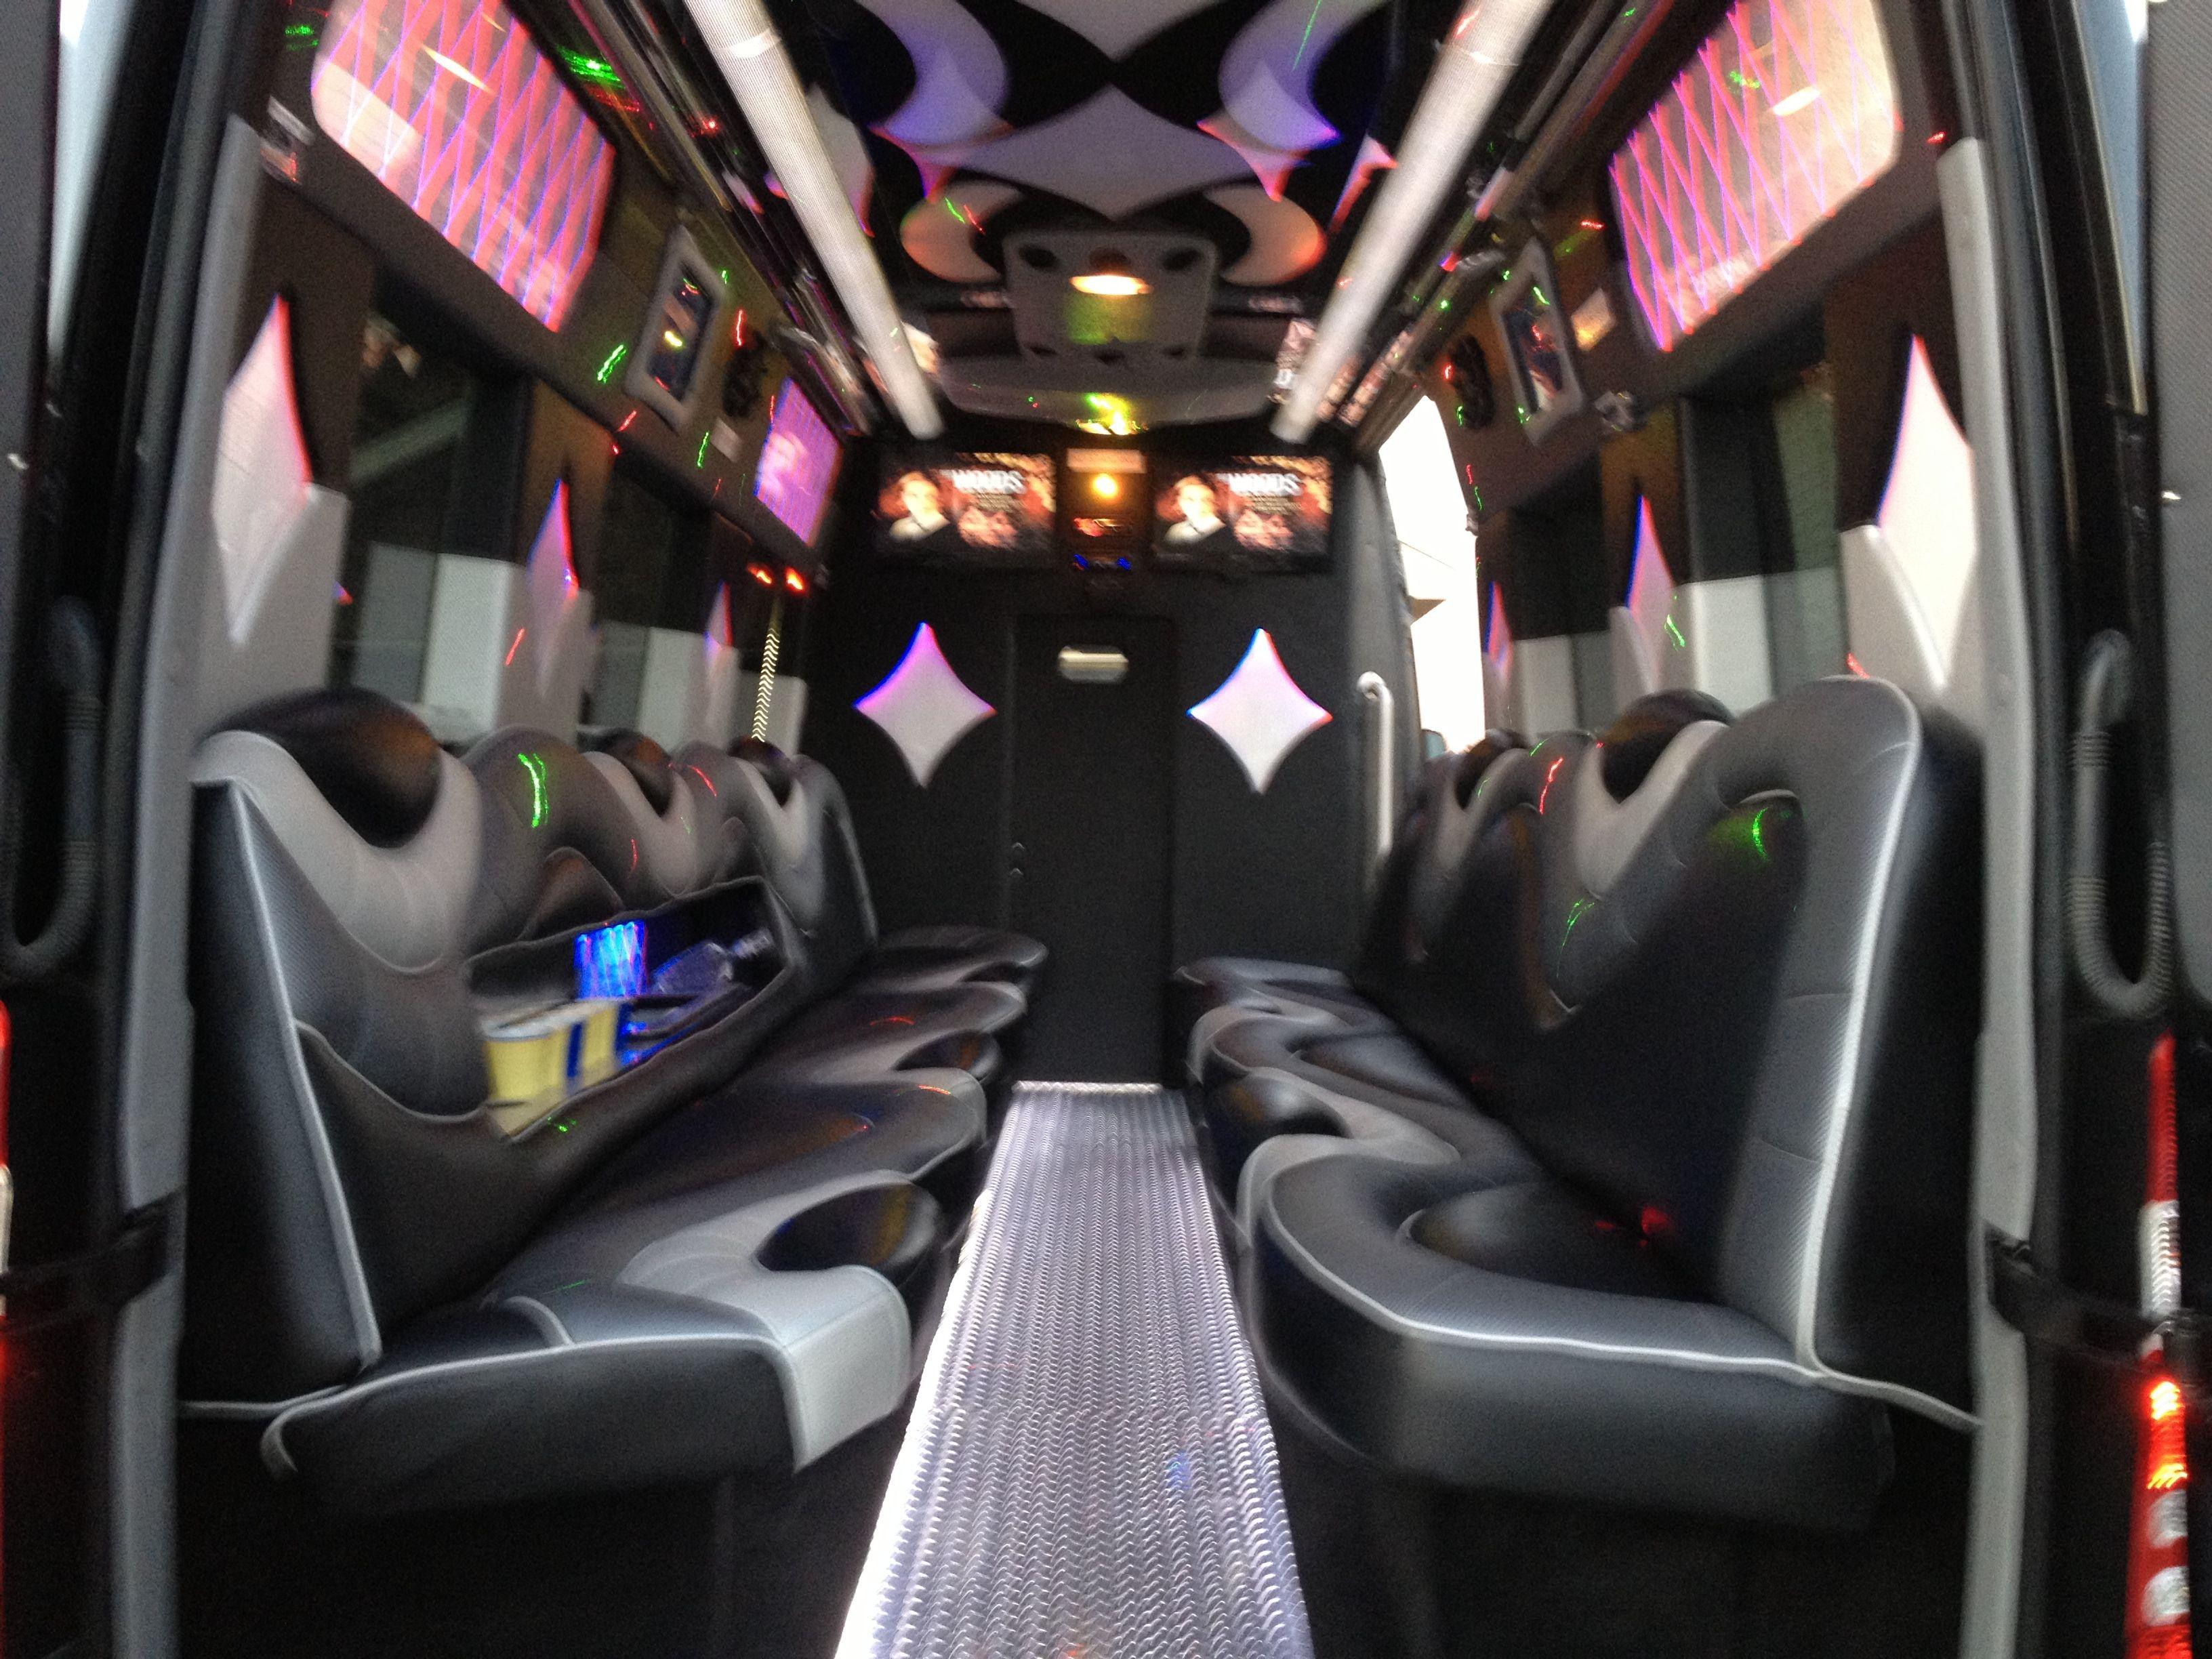 10 12 14 18 passenger mercedes benz sprinter limo bus for miami heat